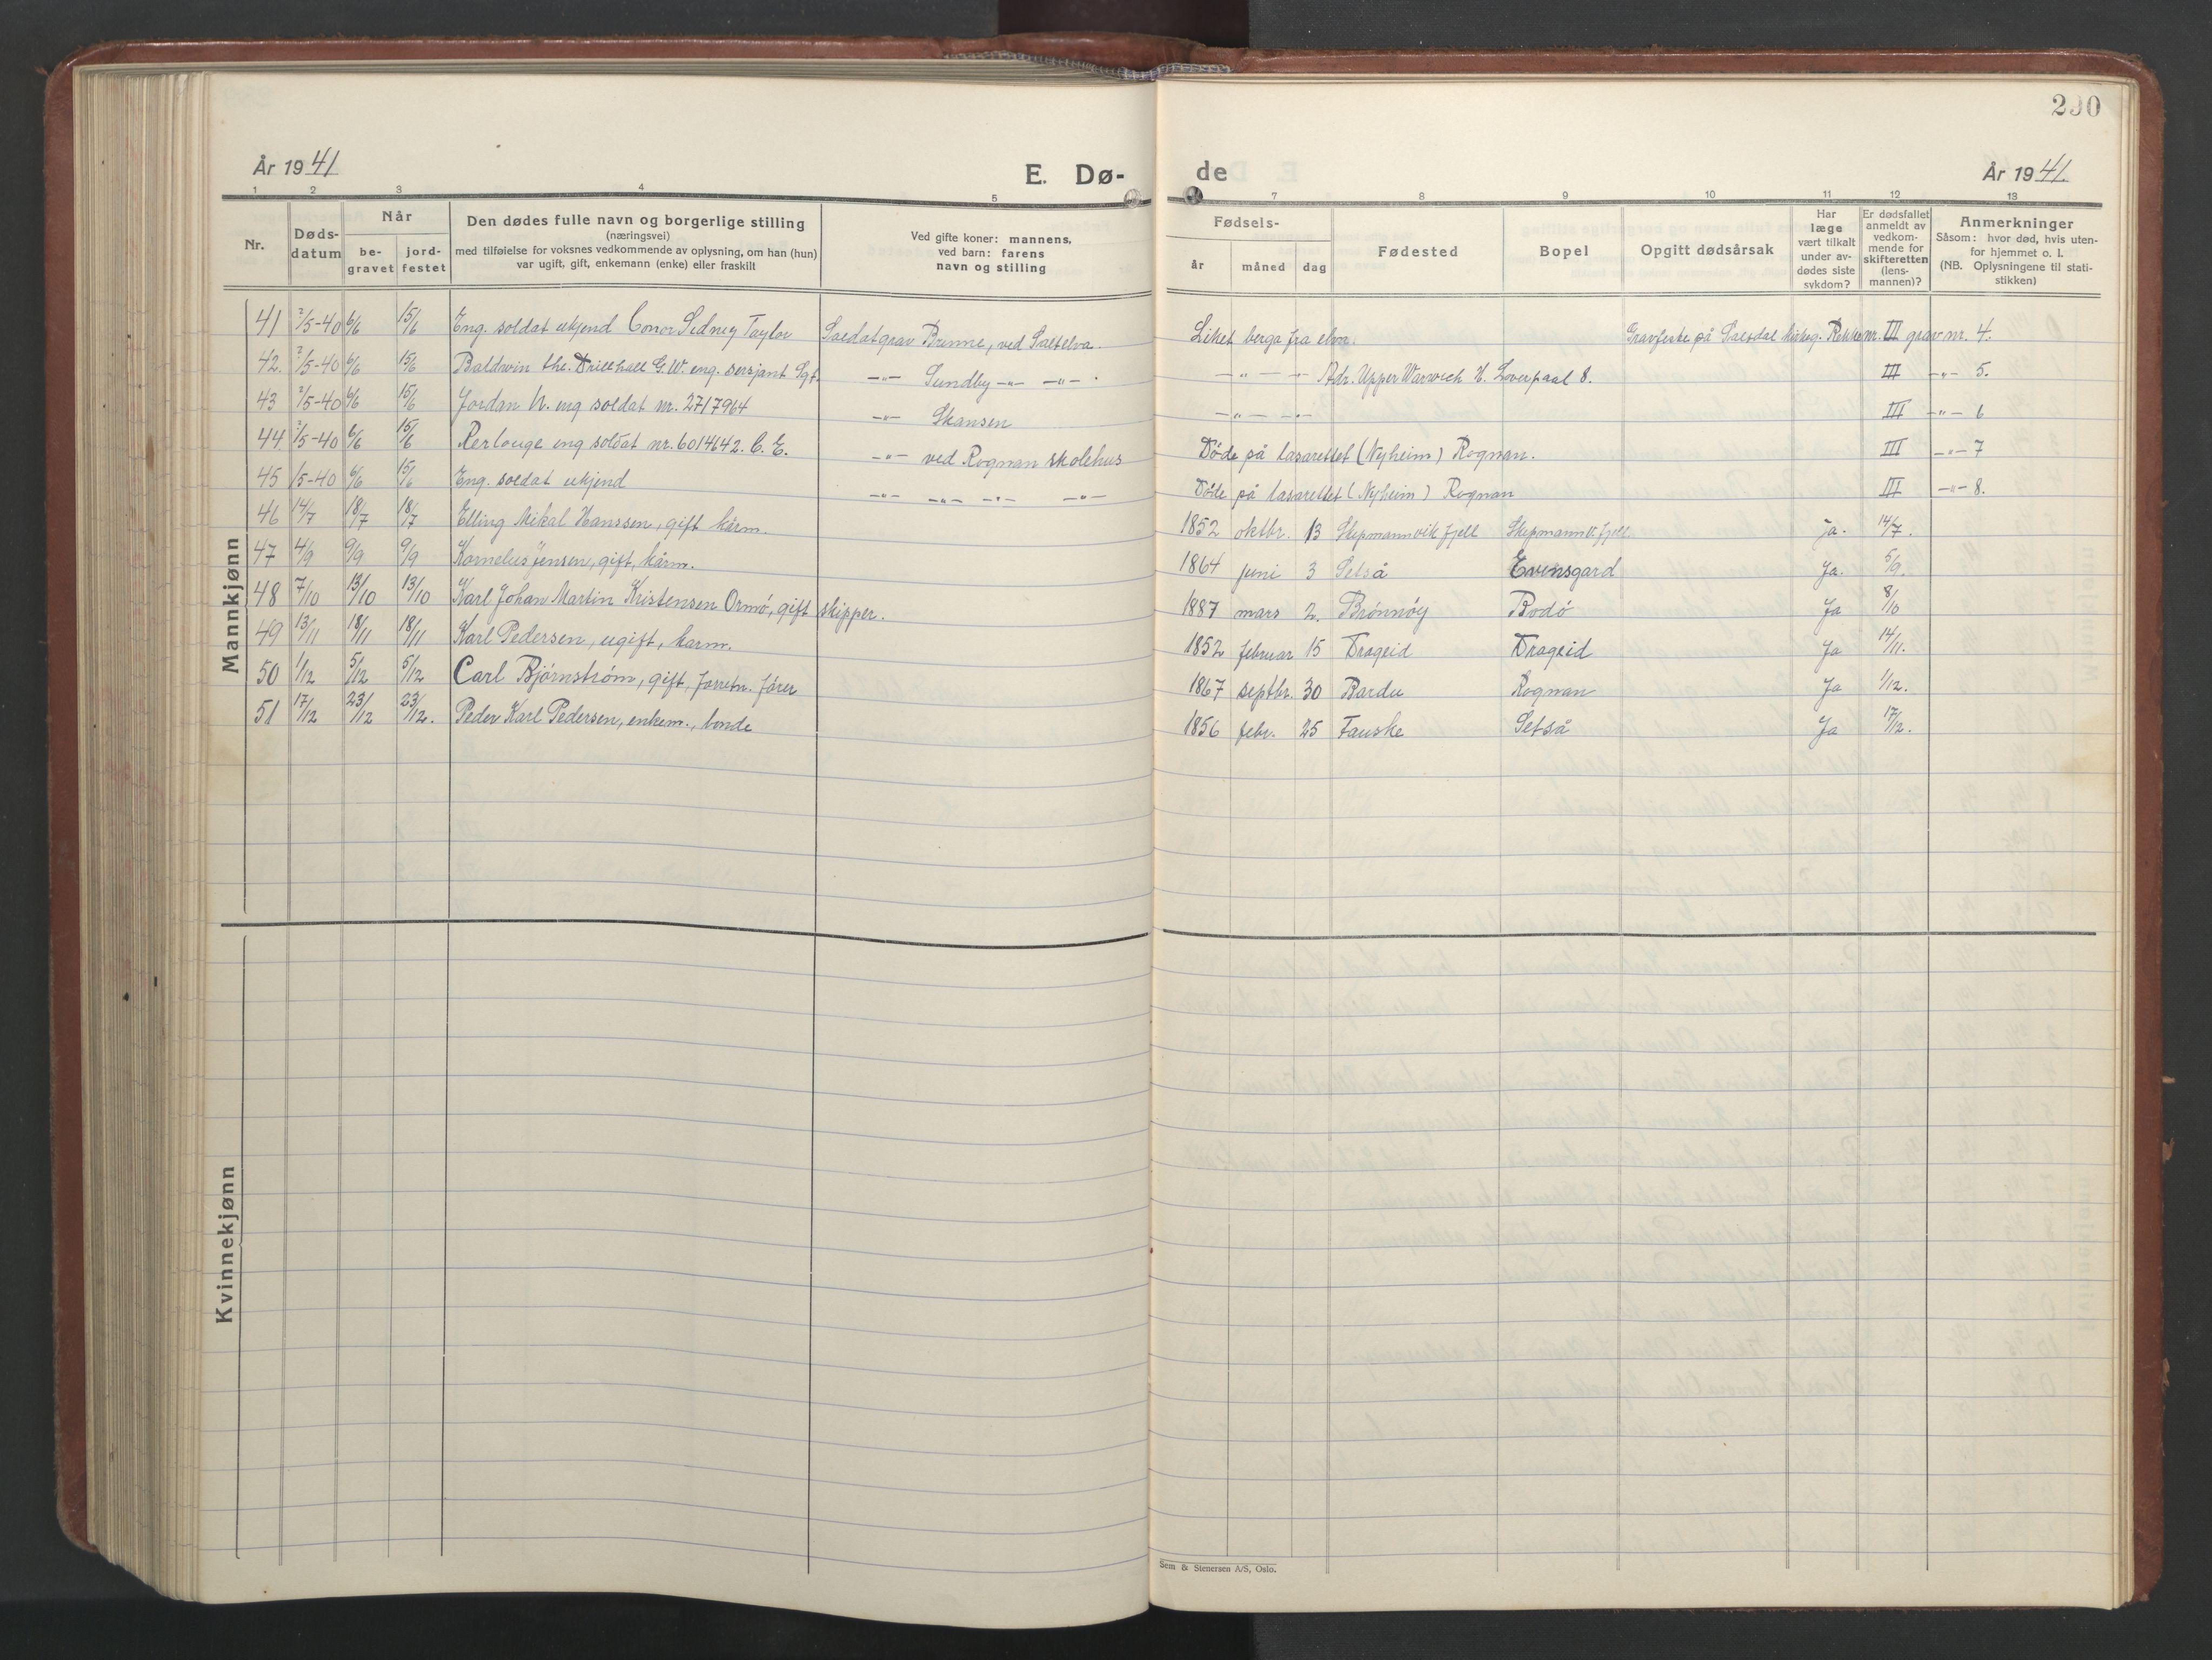 SAT, Ministerialprotokoller, klokkerbøker og fødselsregistre - Nordland, 847/L0680: Klokkerbok nr. 847C08, 1930-1947, s. 290